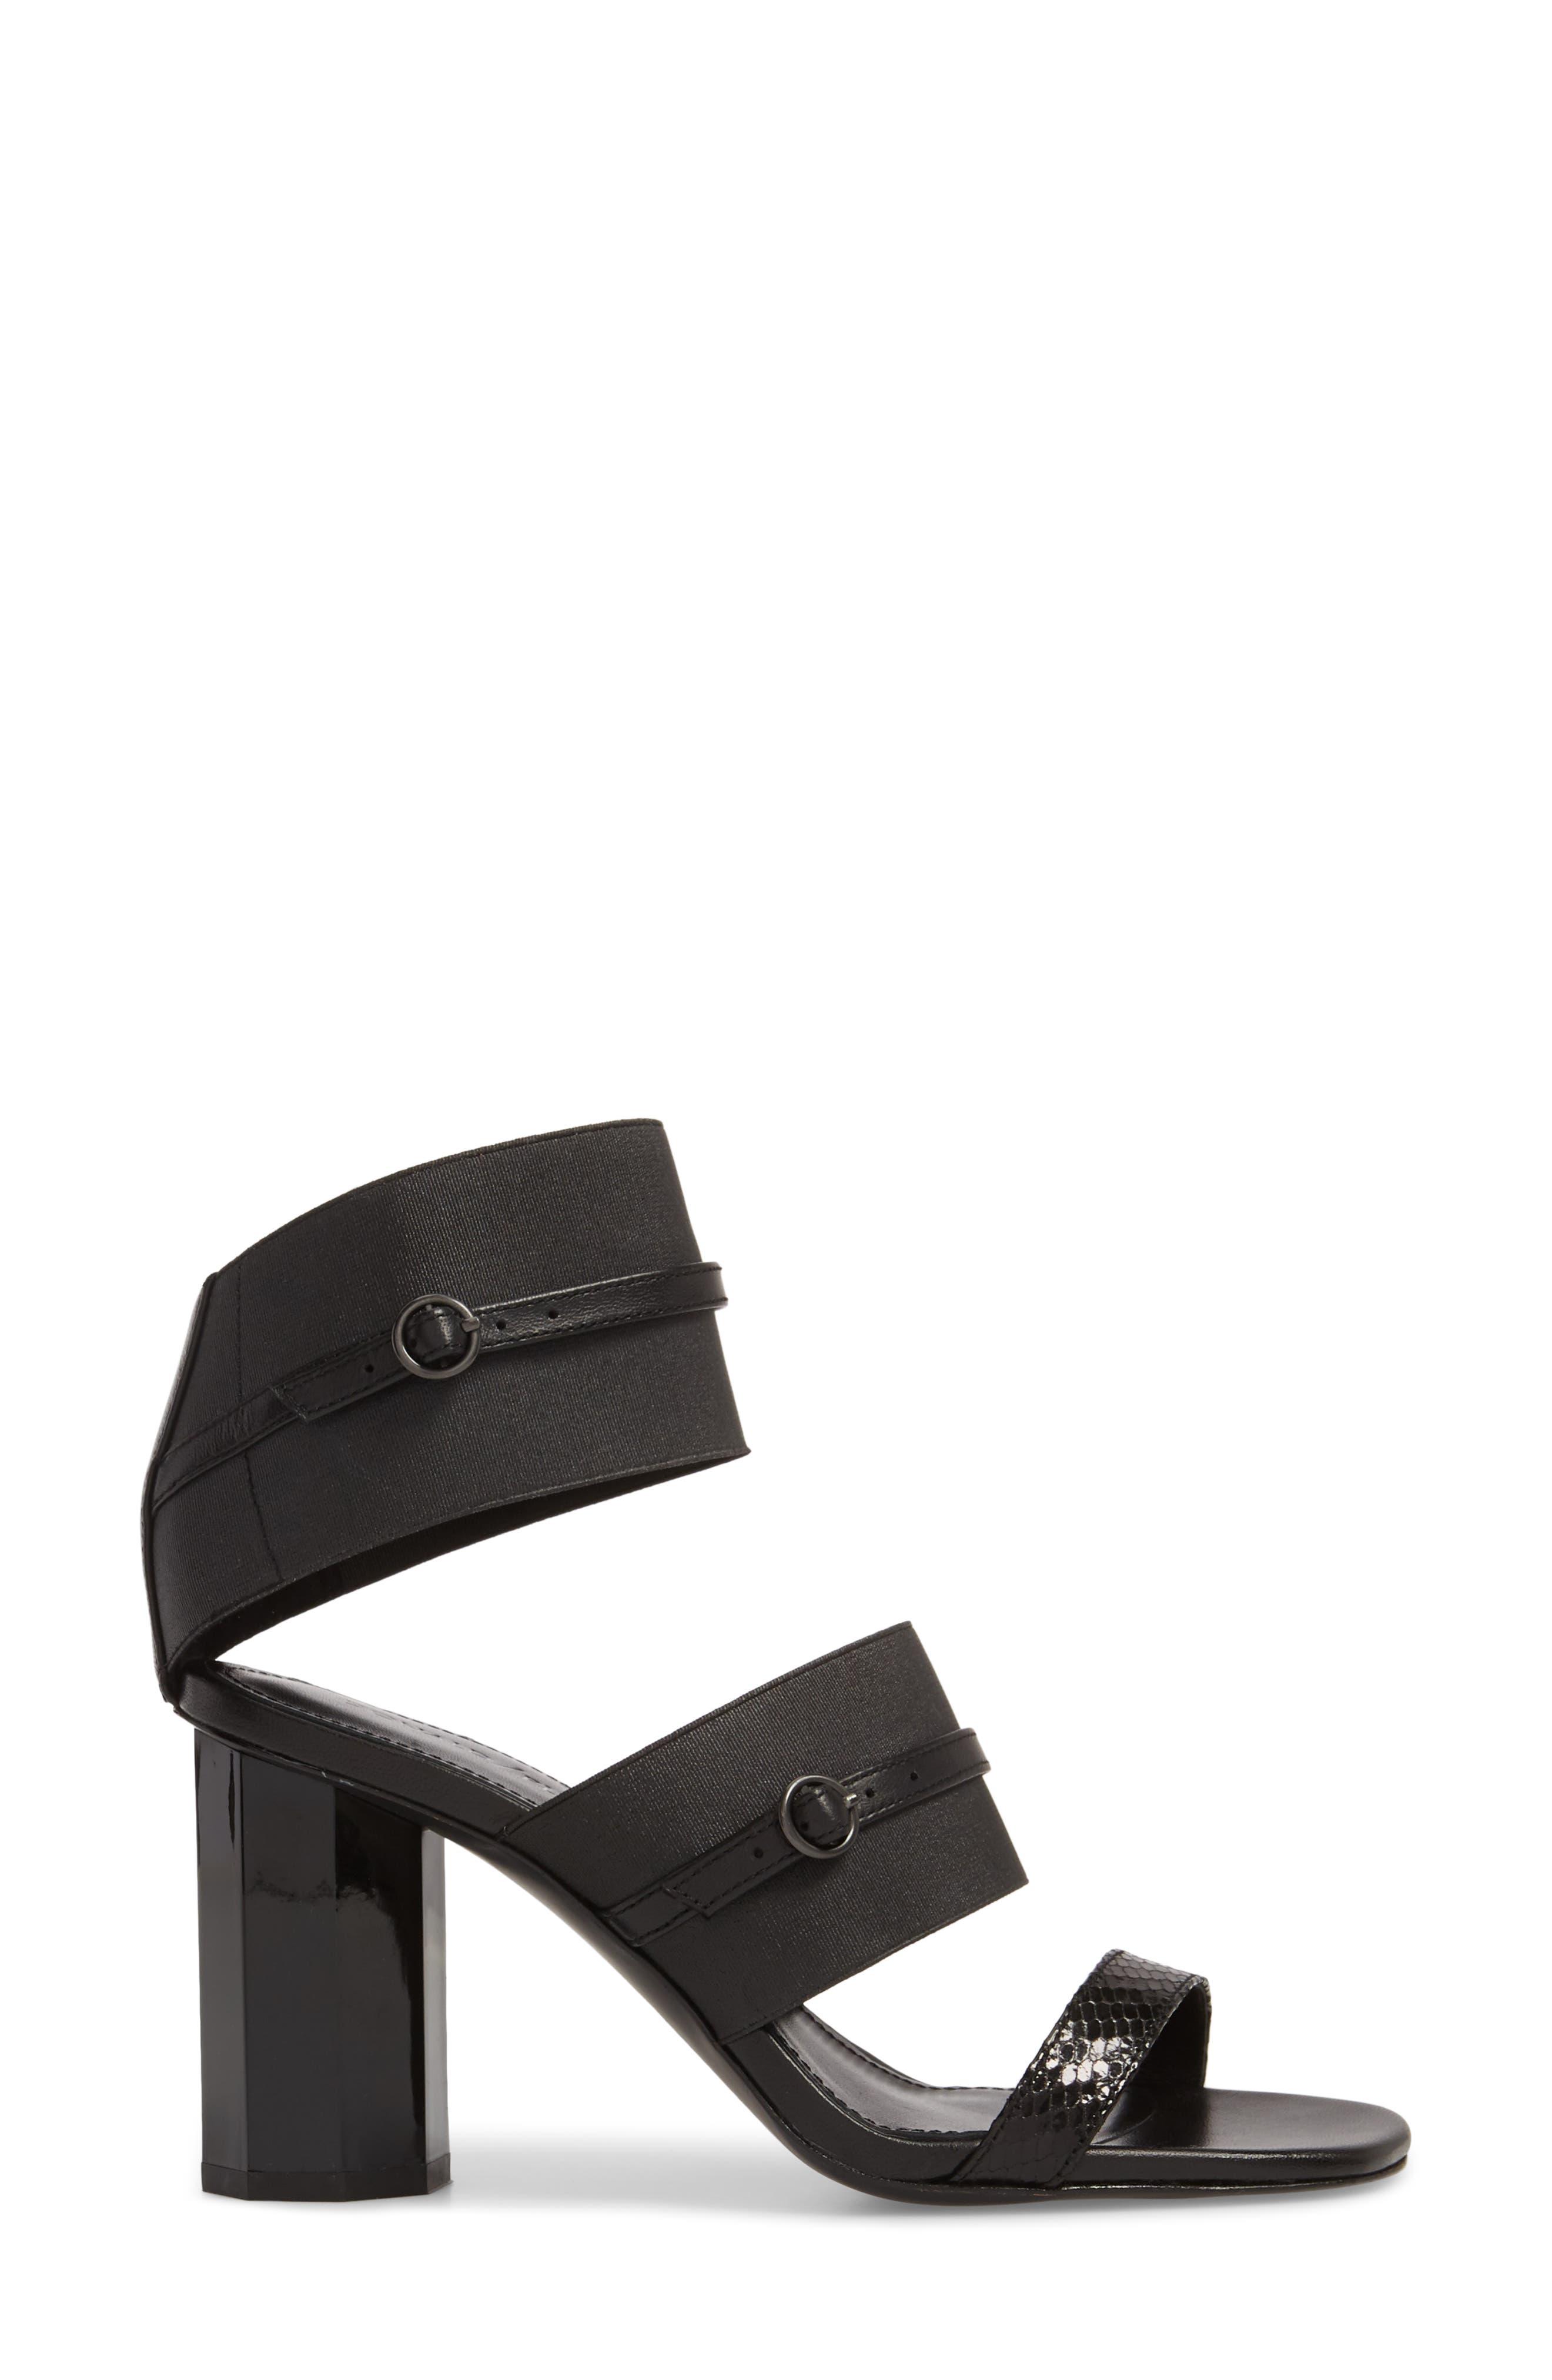 Edie Sandal,                             Alternate thumbnail 4, color,                             Black Leather